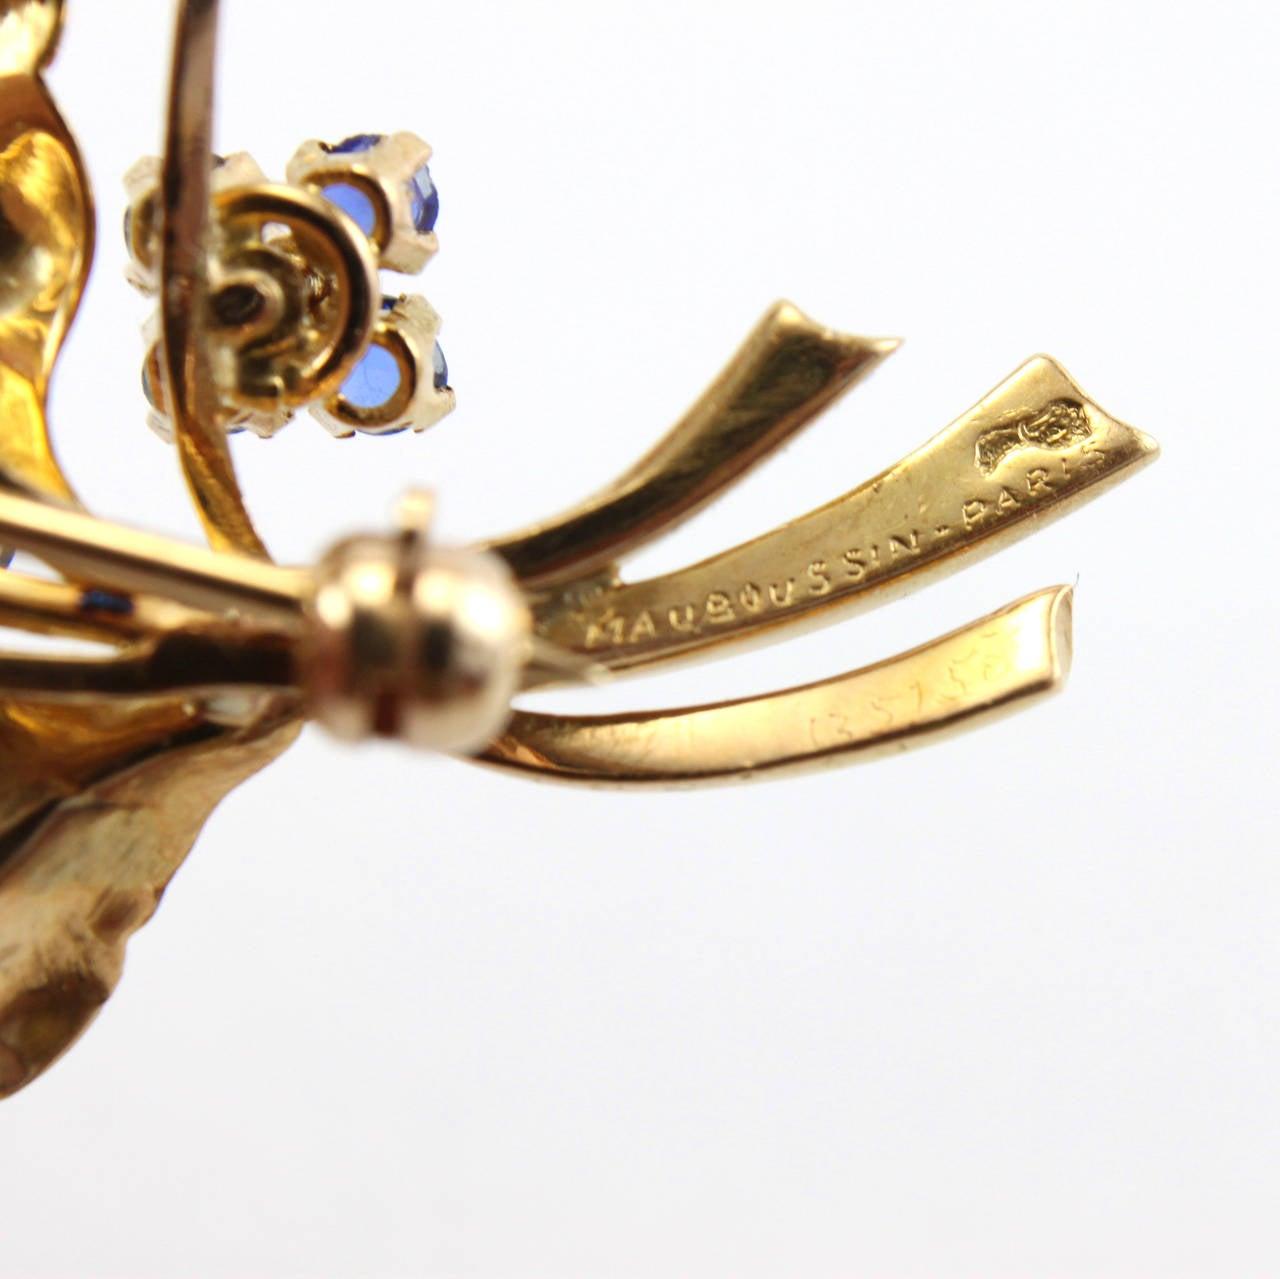 Retro 1948 Mauboussin Ruby Sapphire Diamond Flower Brooch or Pendant For Sale